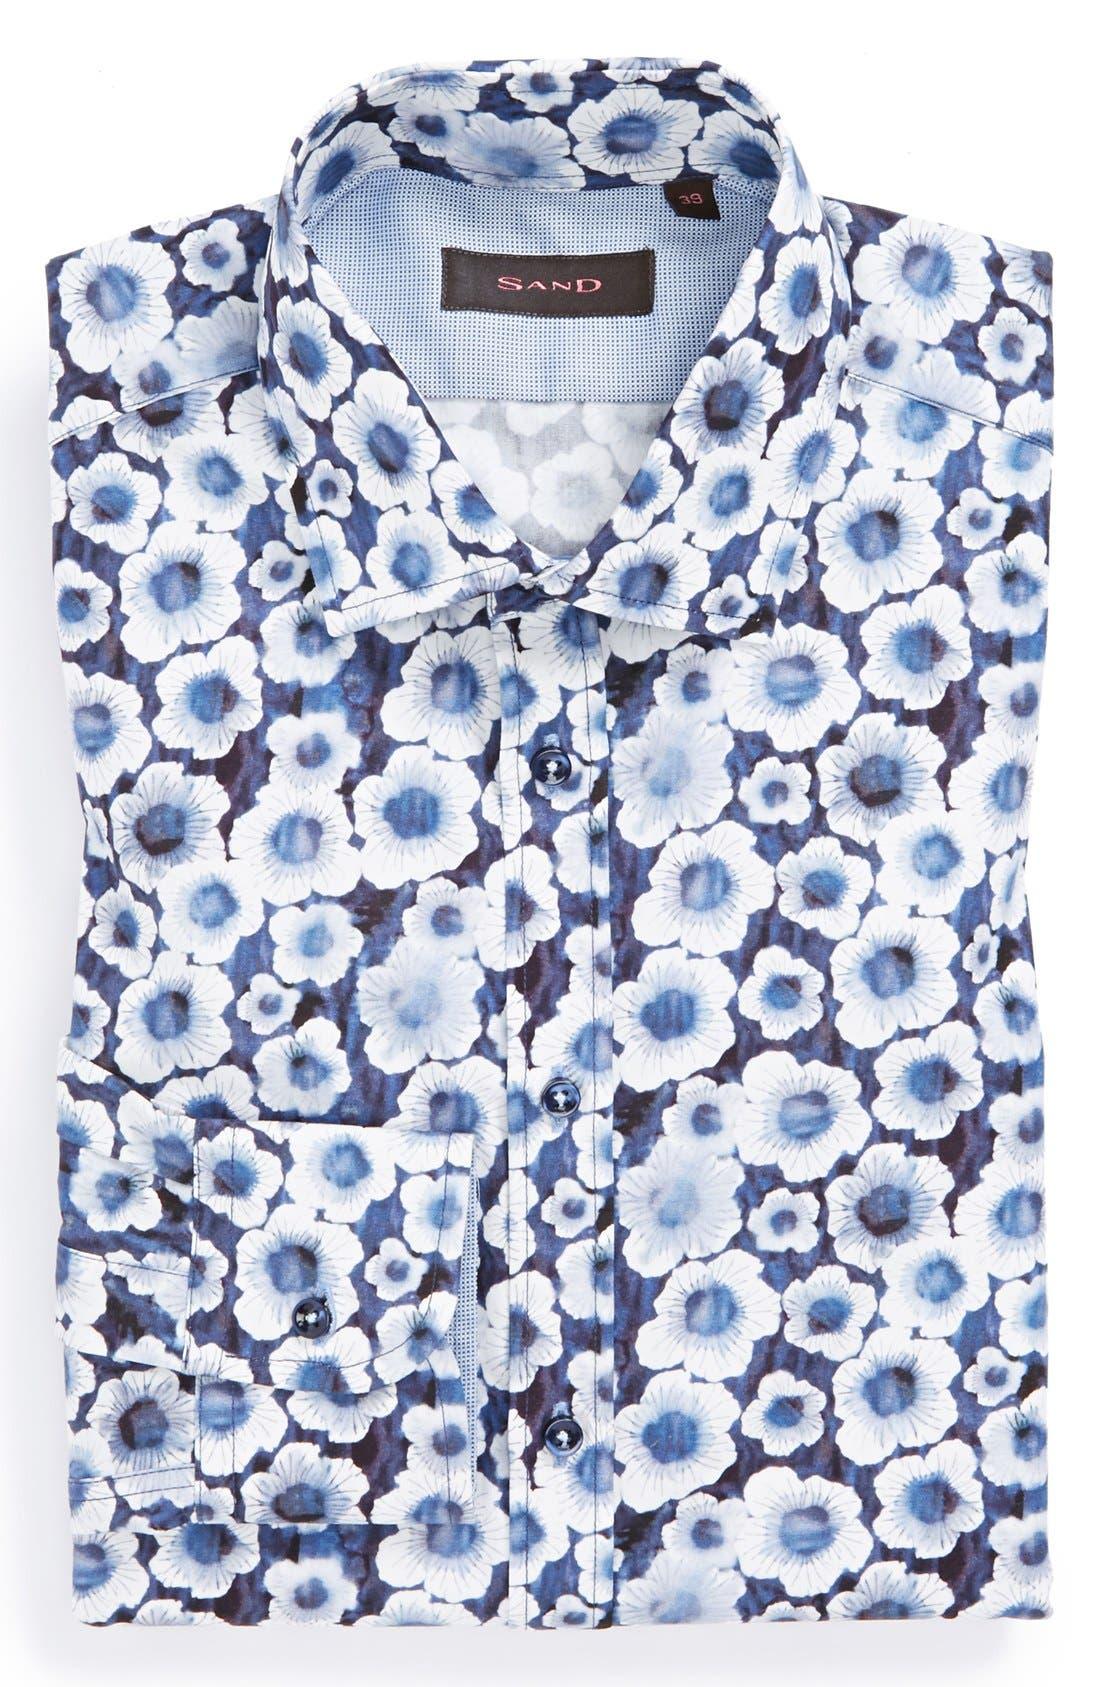 Main Image - SAND Trim Fit Floral Print Dress Shirt